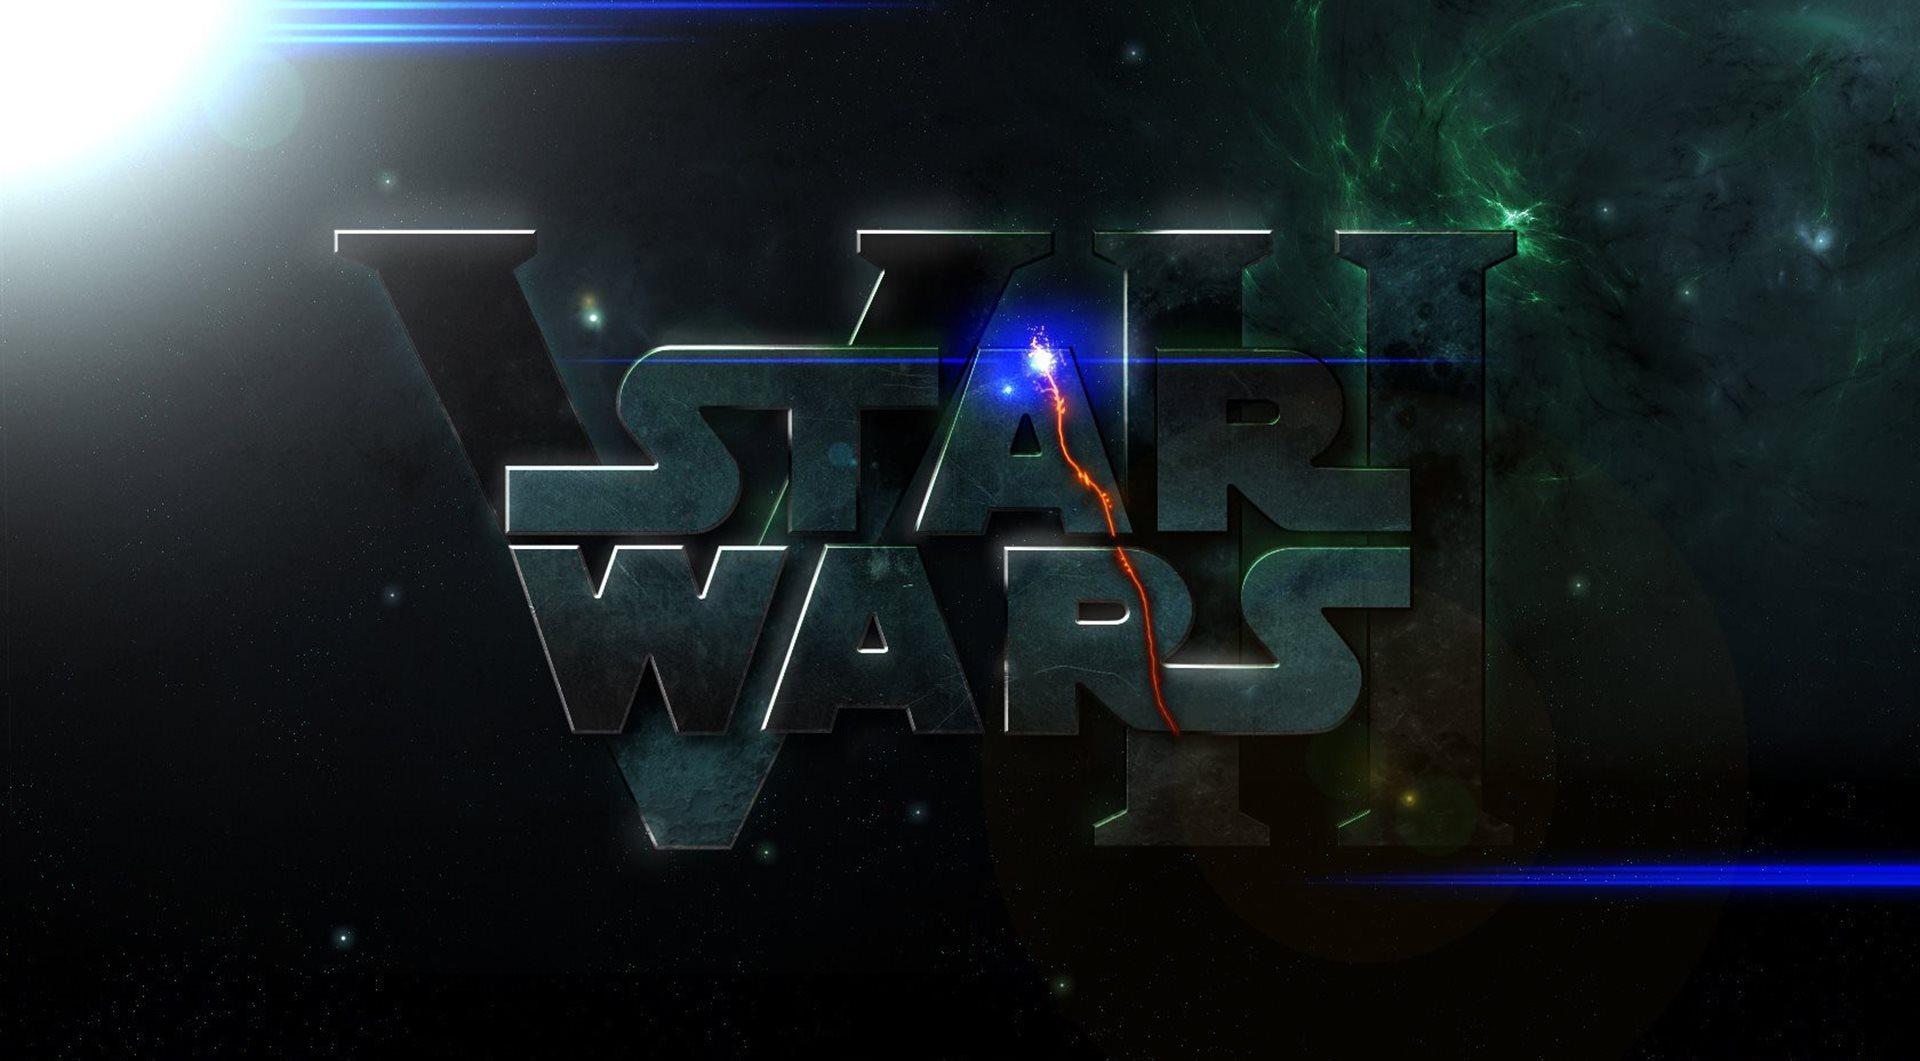 Star Wars Episode VII The Force Awakens 2015 Film HD Wallpaper 1920x1061